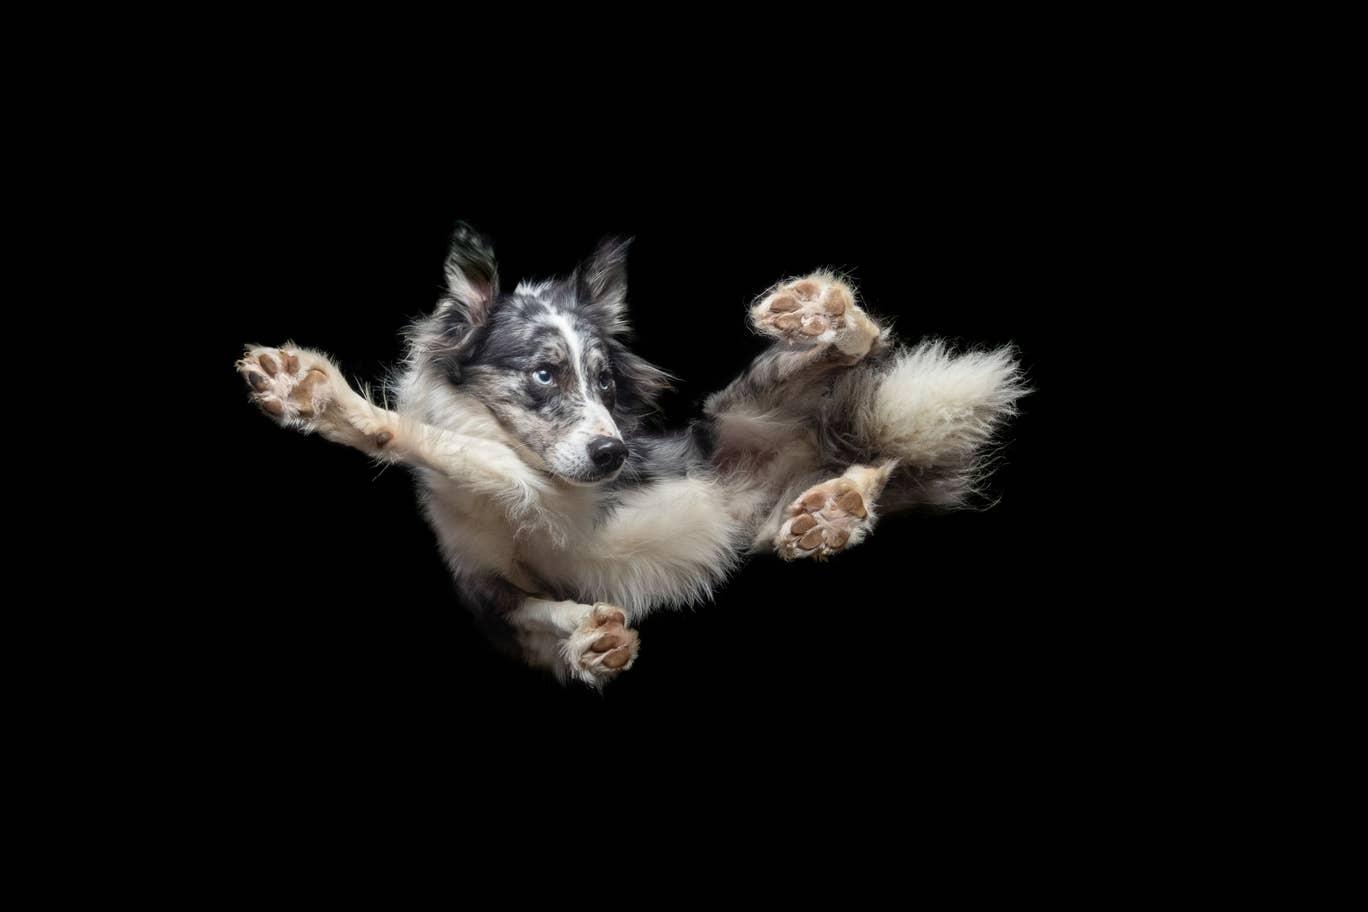 cachorros fotos ensaio fotográfico